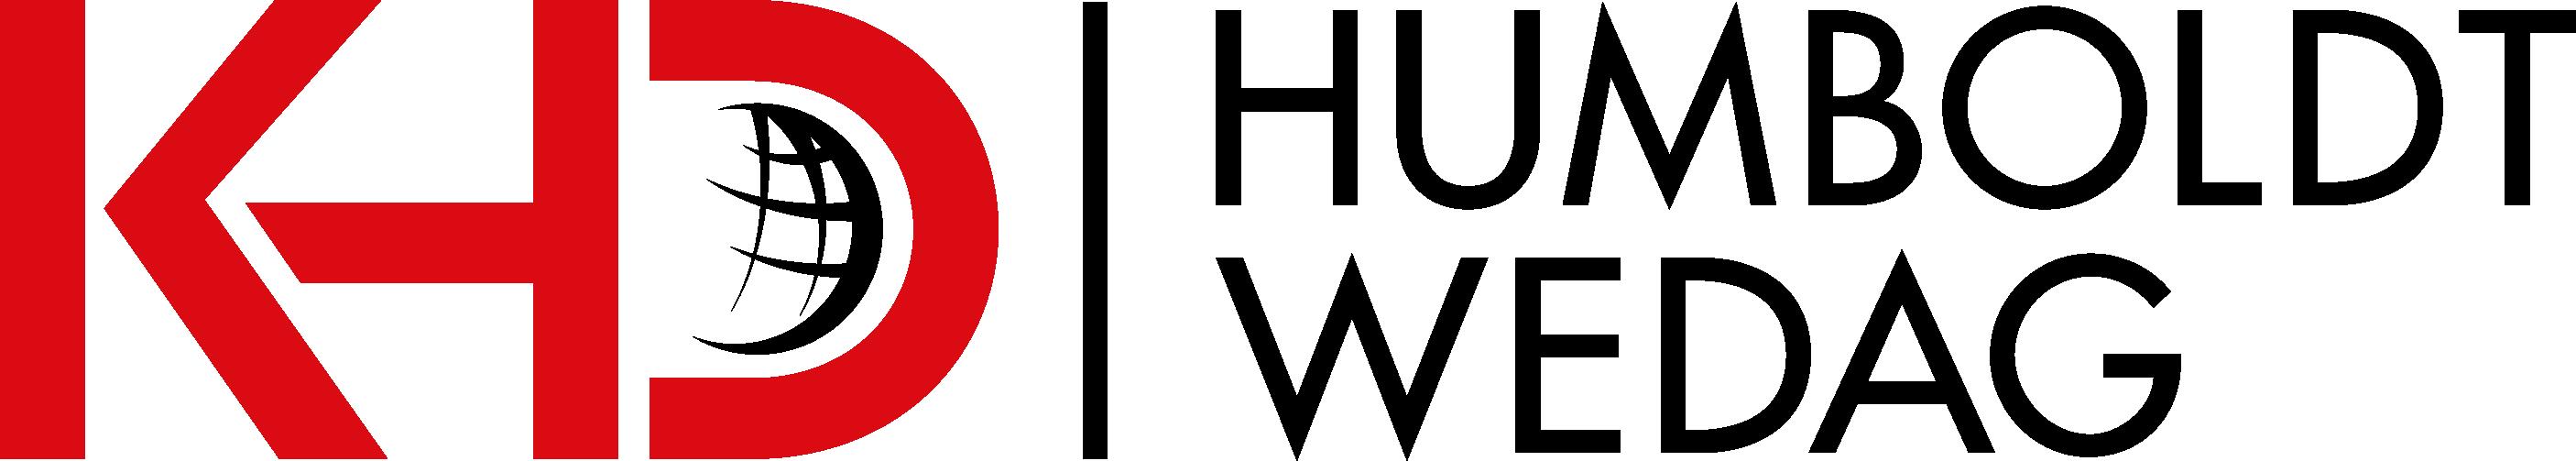 khd_logo_4c